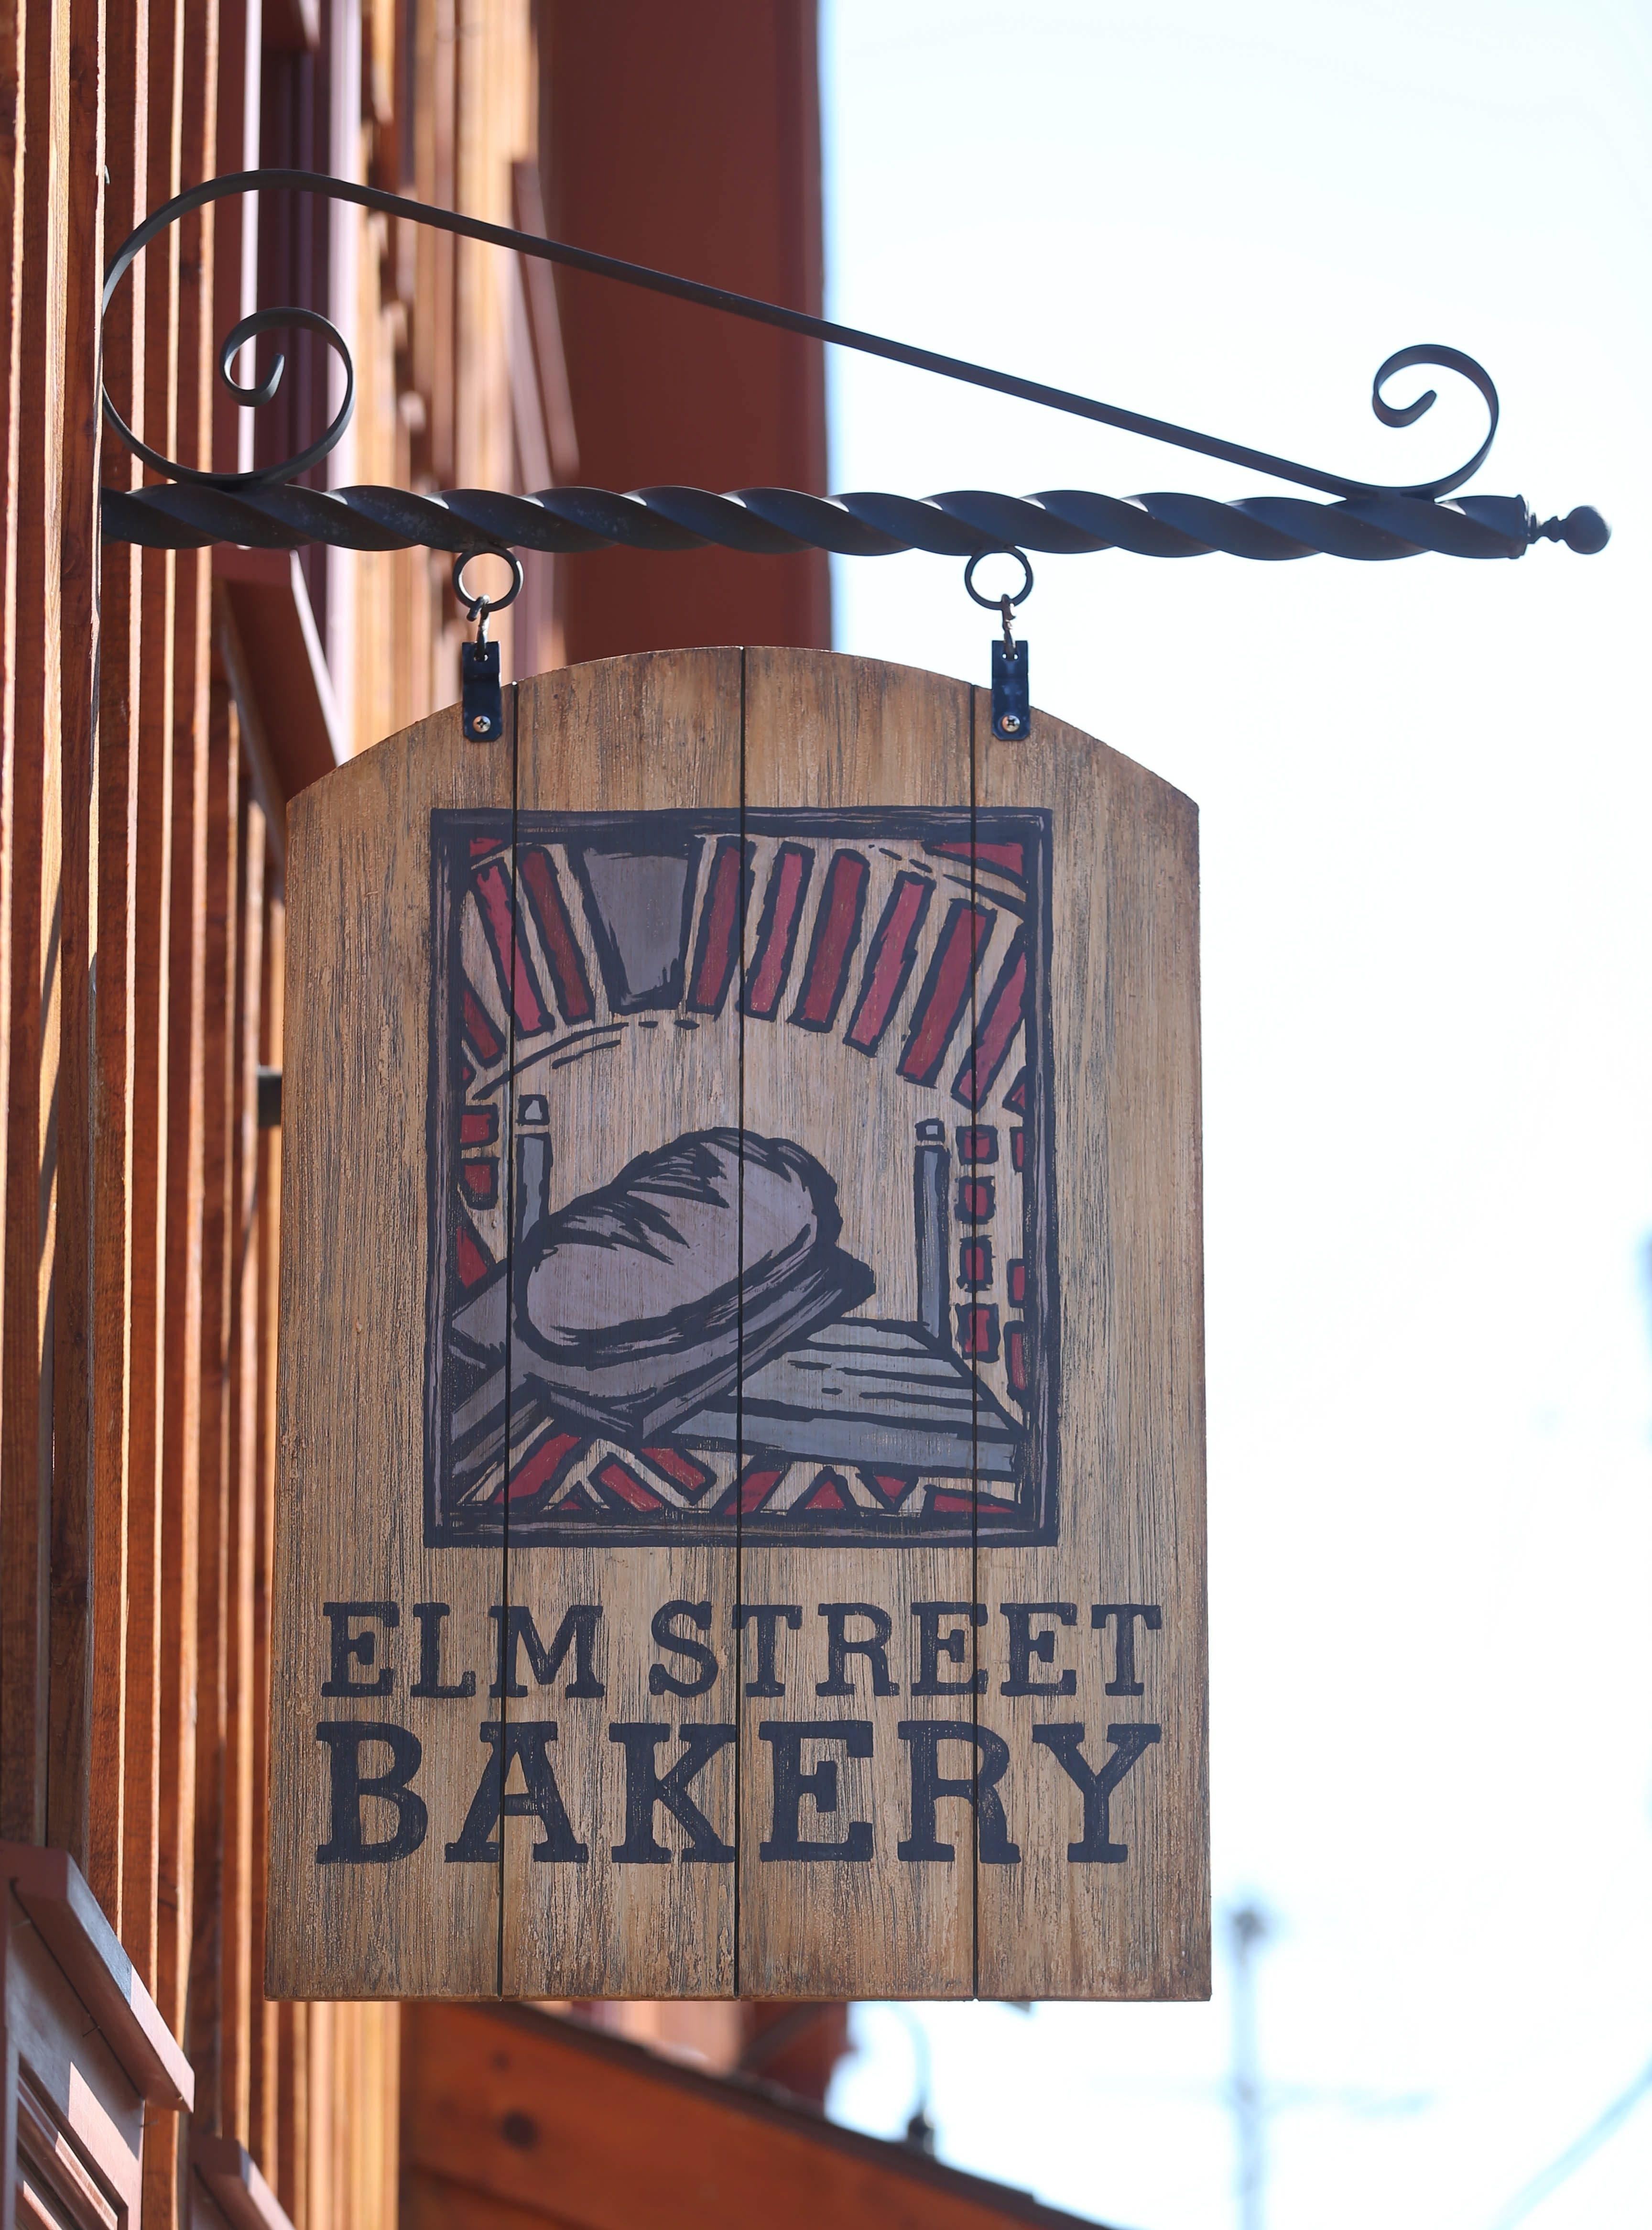 Elm Street Bakery at 72 Elm St. in East Aurora, makes a.  Photo taken, Tuesday, Sept. 15, 2015.  (Sharon Cantillon/Buffalo News)